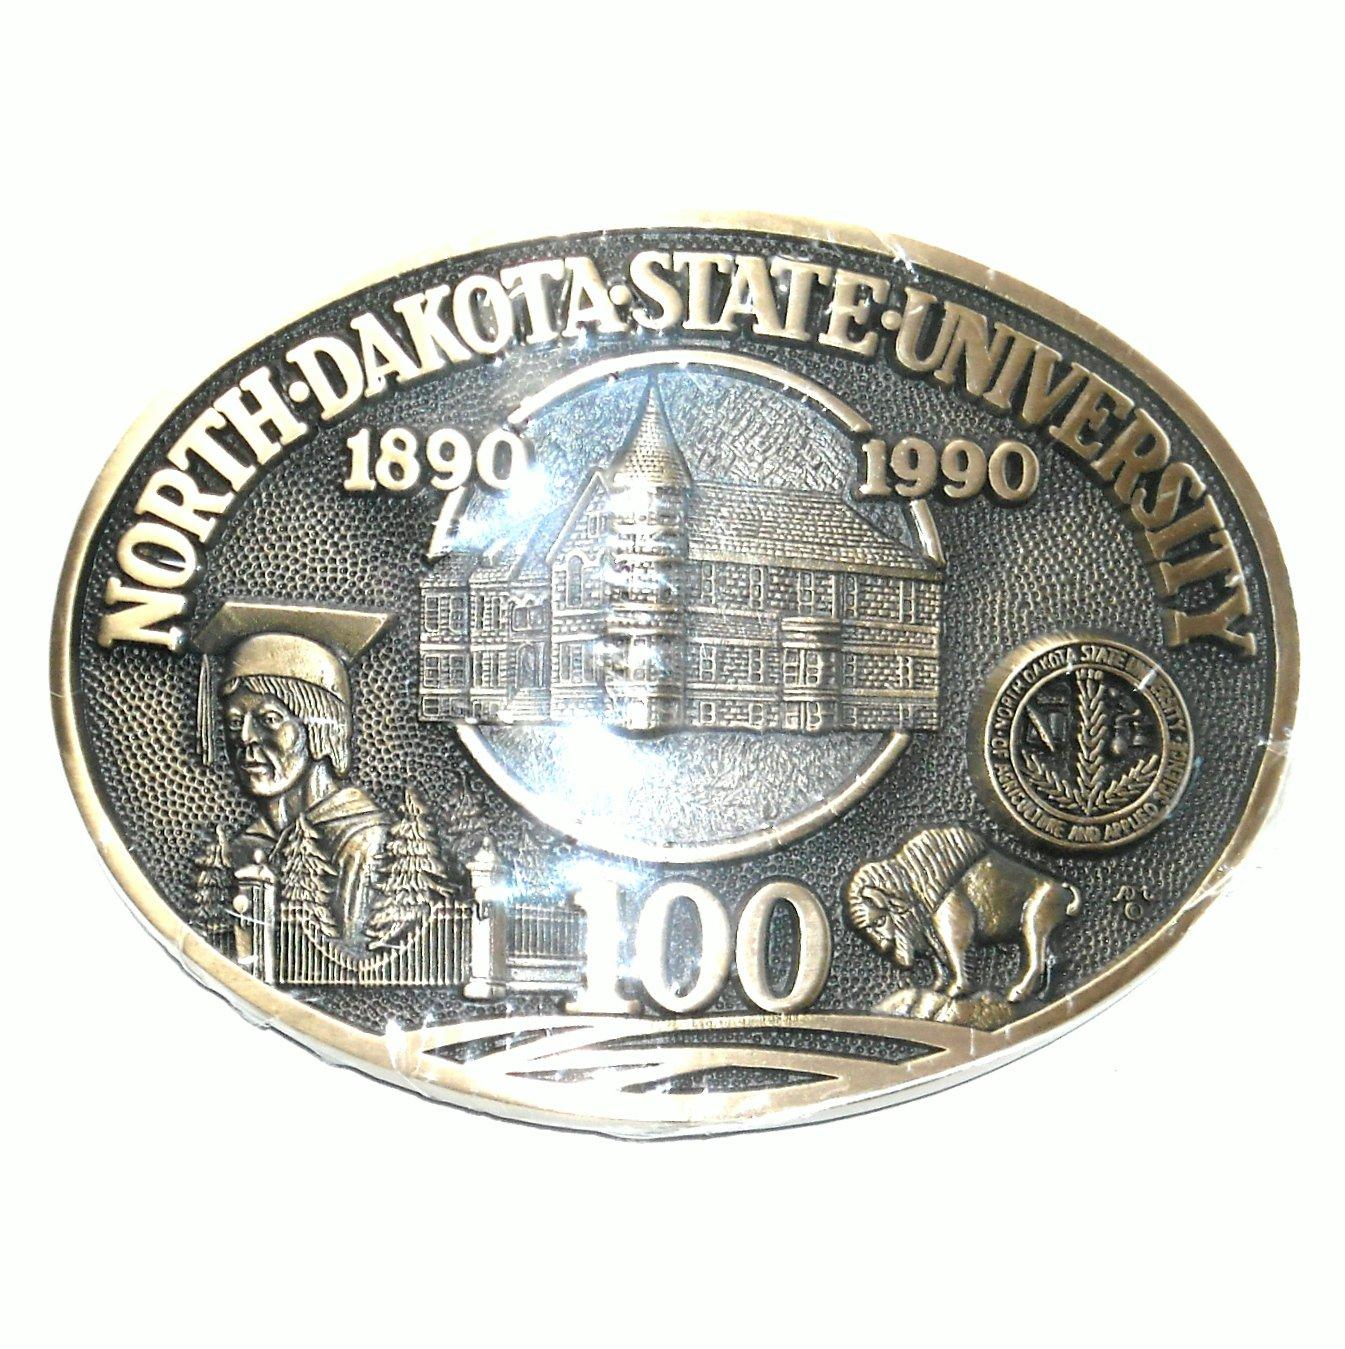 North Dakota State University ADM Limited Edition Solid Brass Belt Buckle